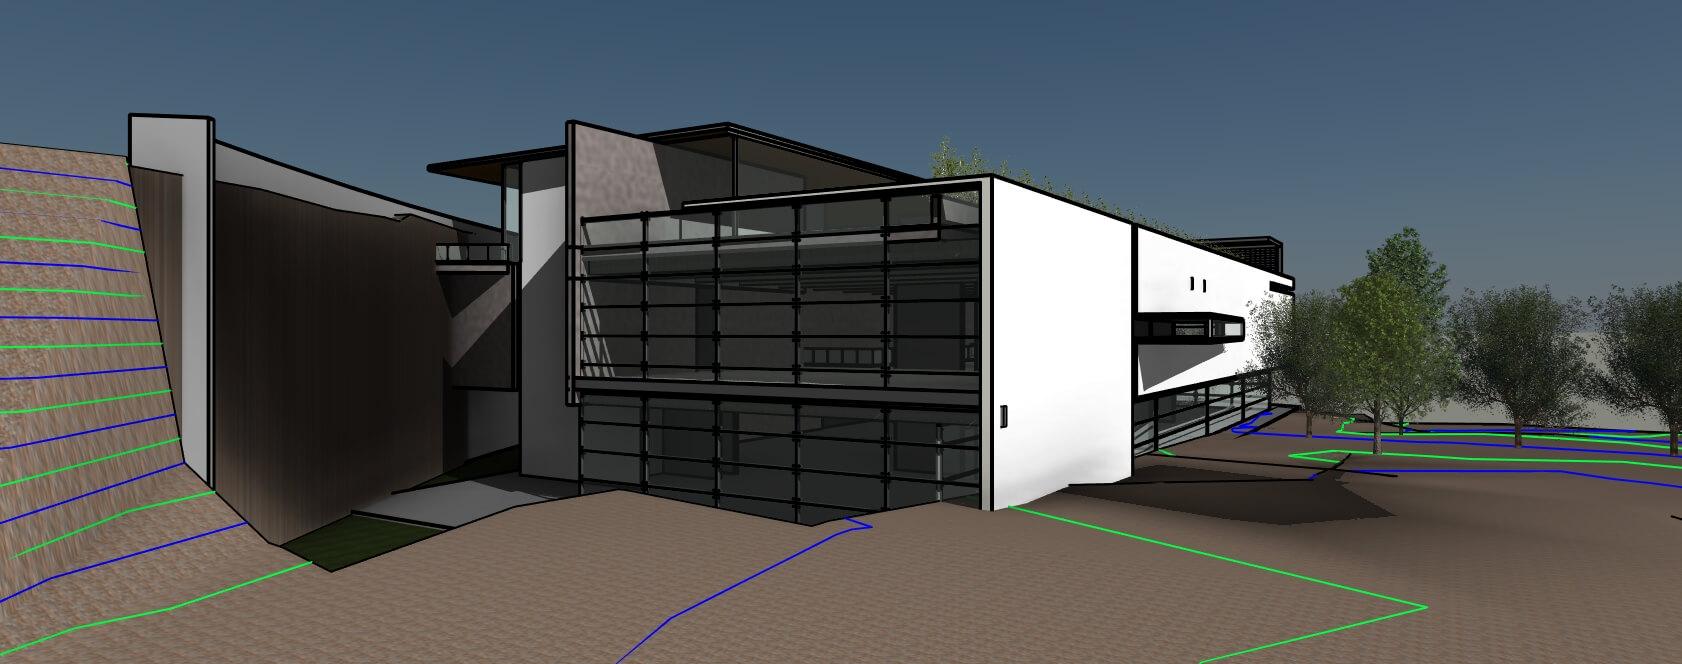 RZ-3D-new-3D-View-חזית-דרומית